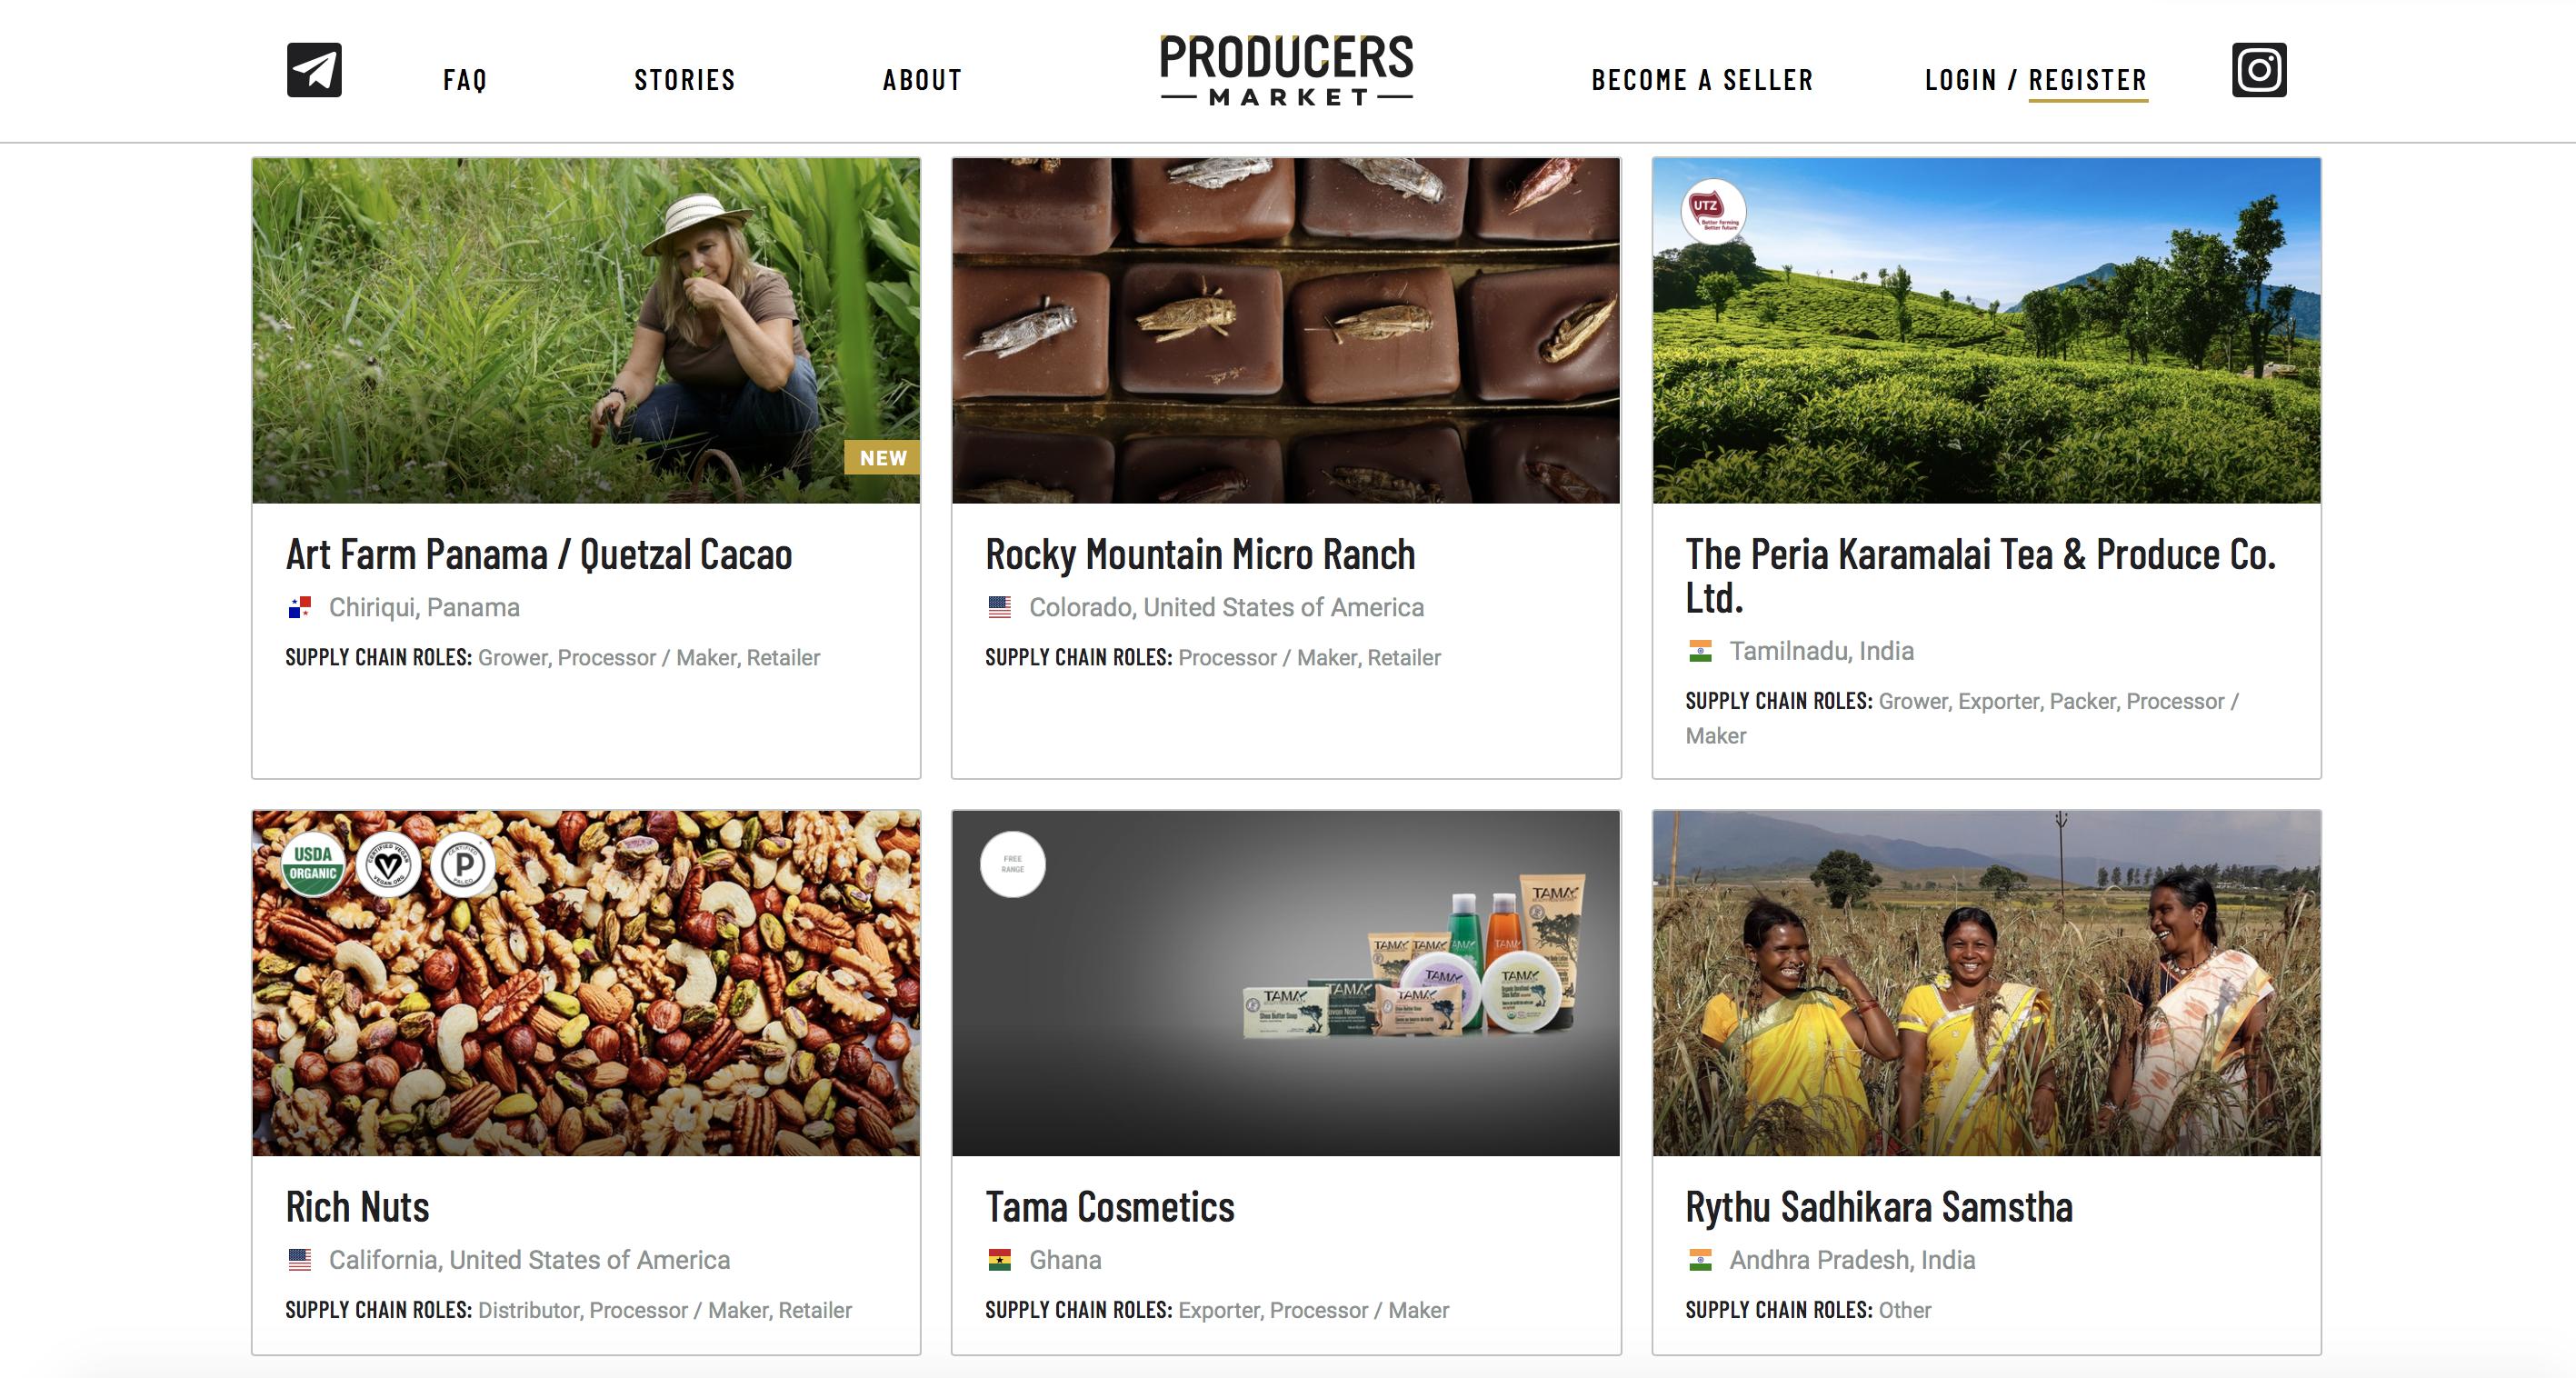 Producer Organization Page